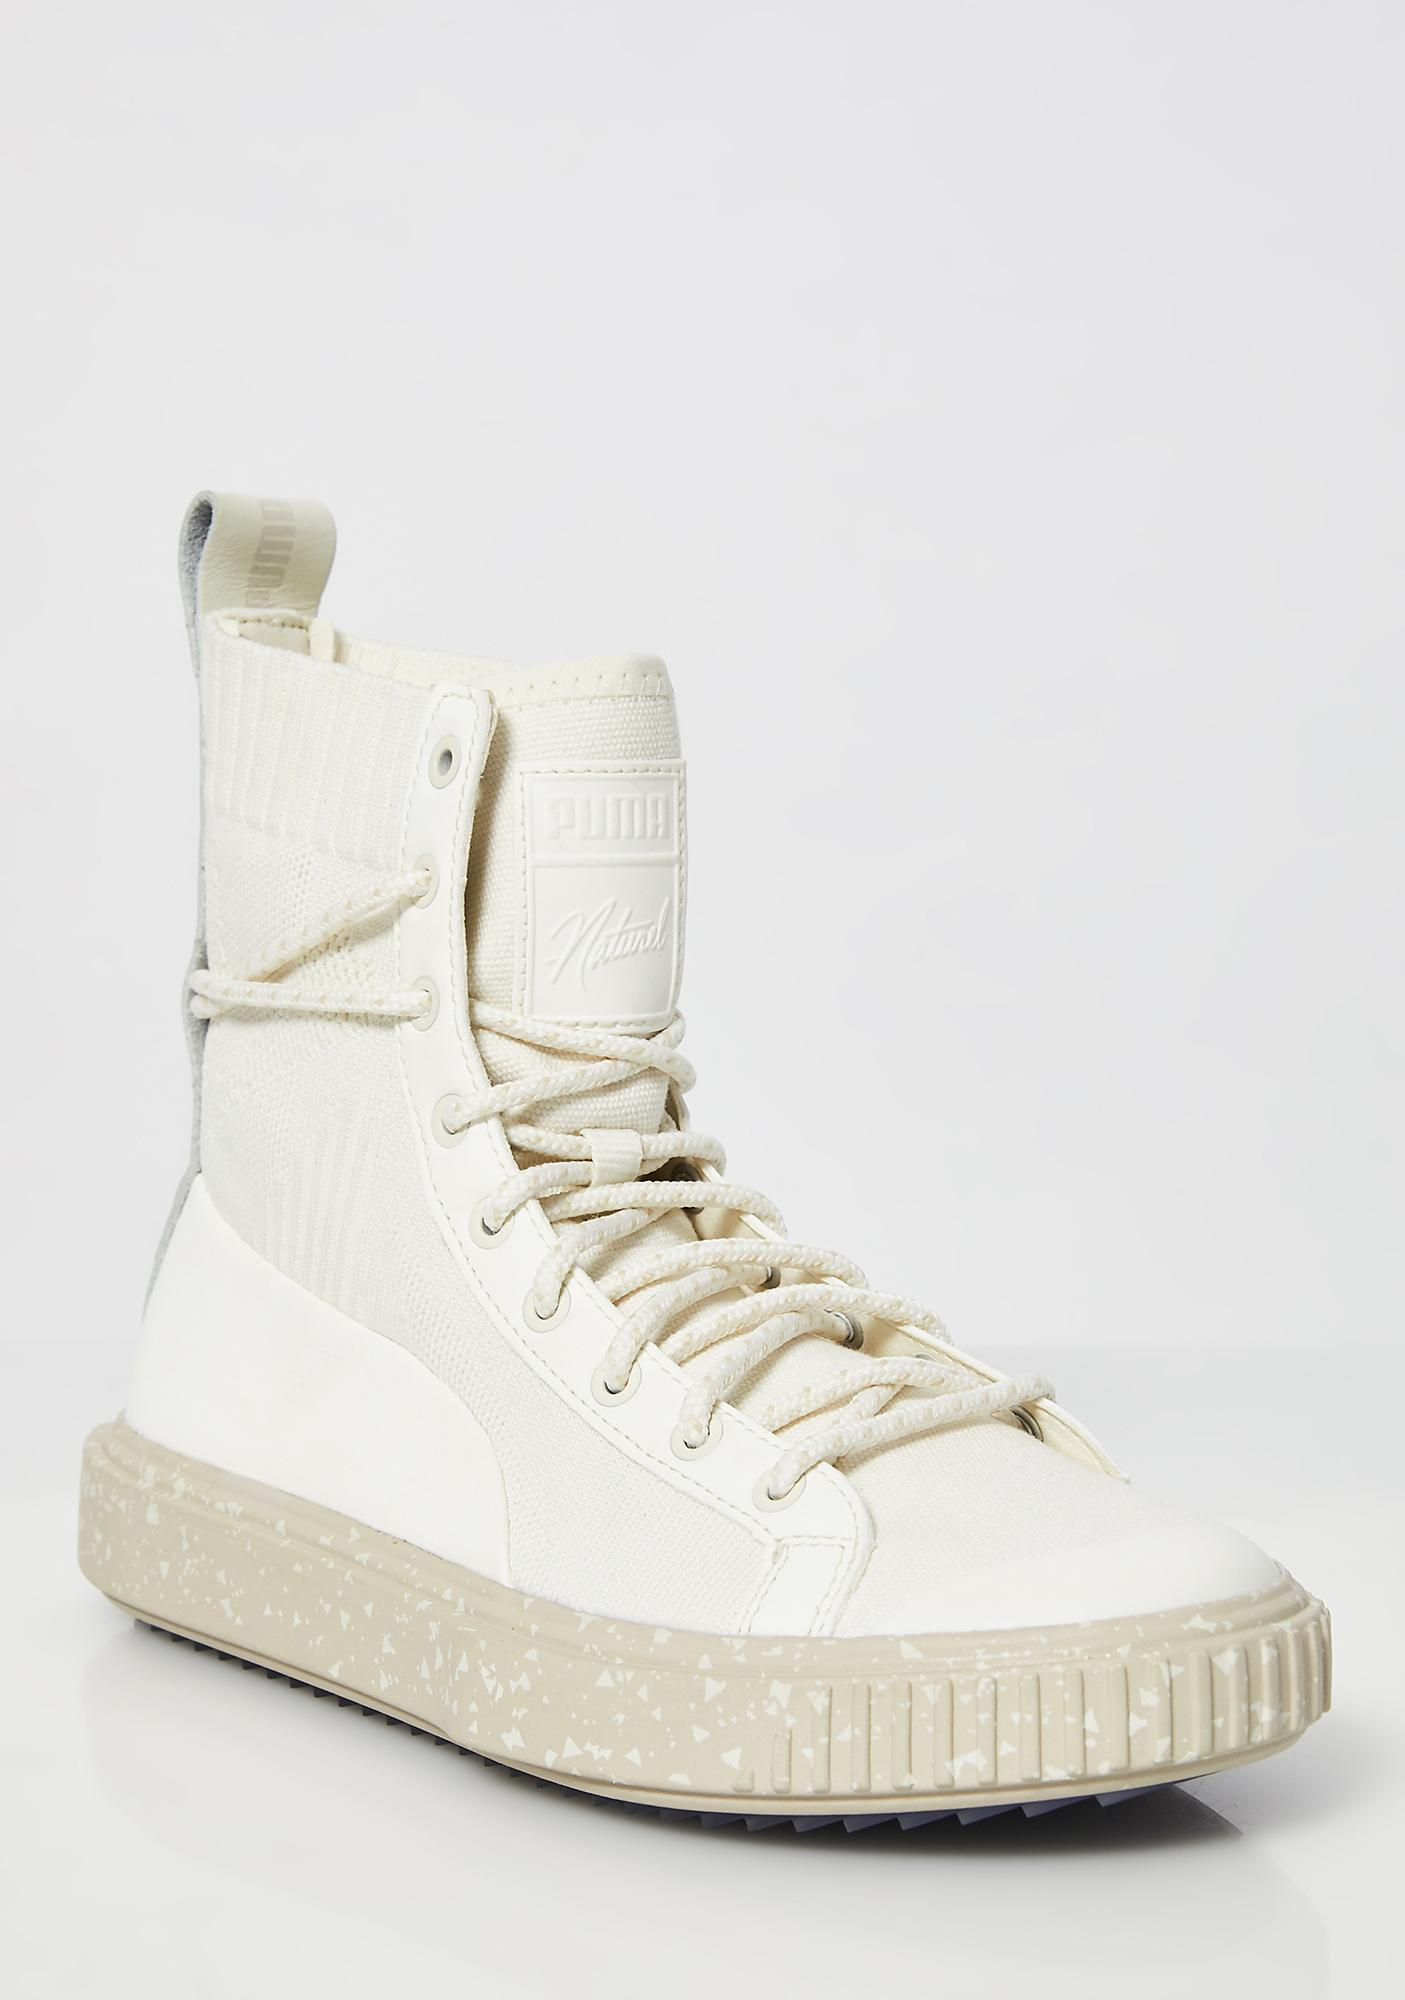 ... PUMA X Naturel Breaker Sneaker Boots ... 07977b766